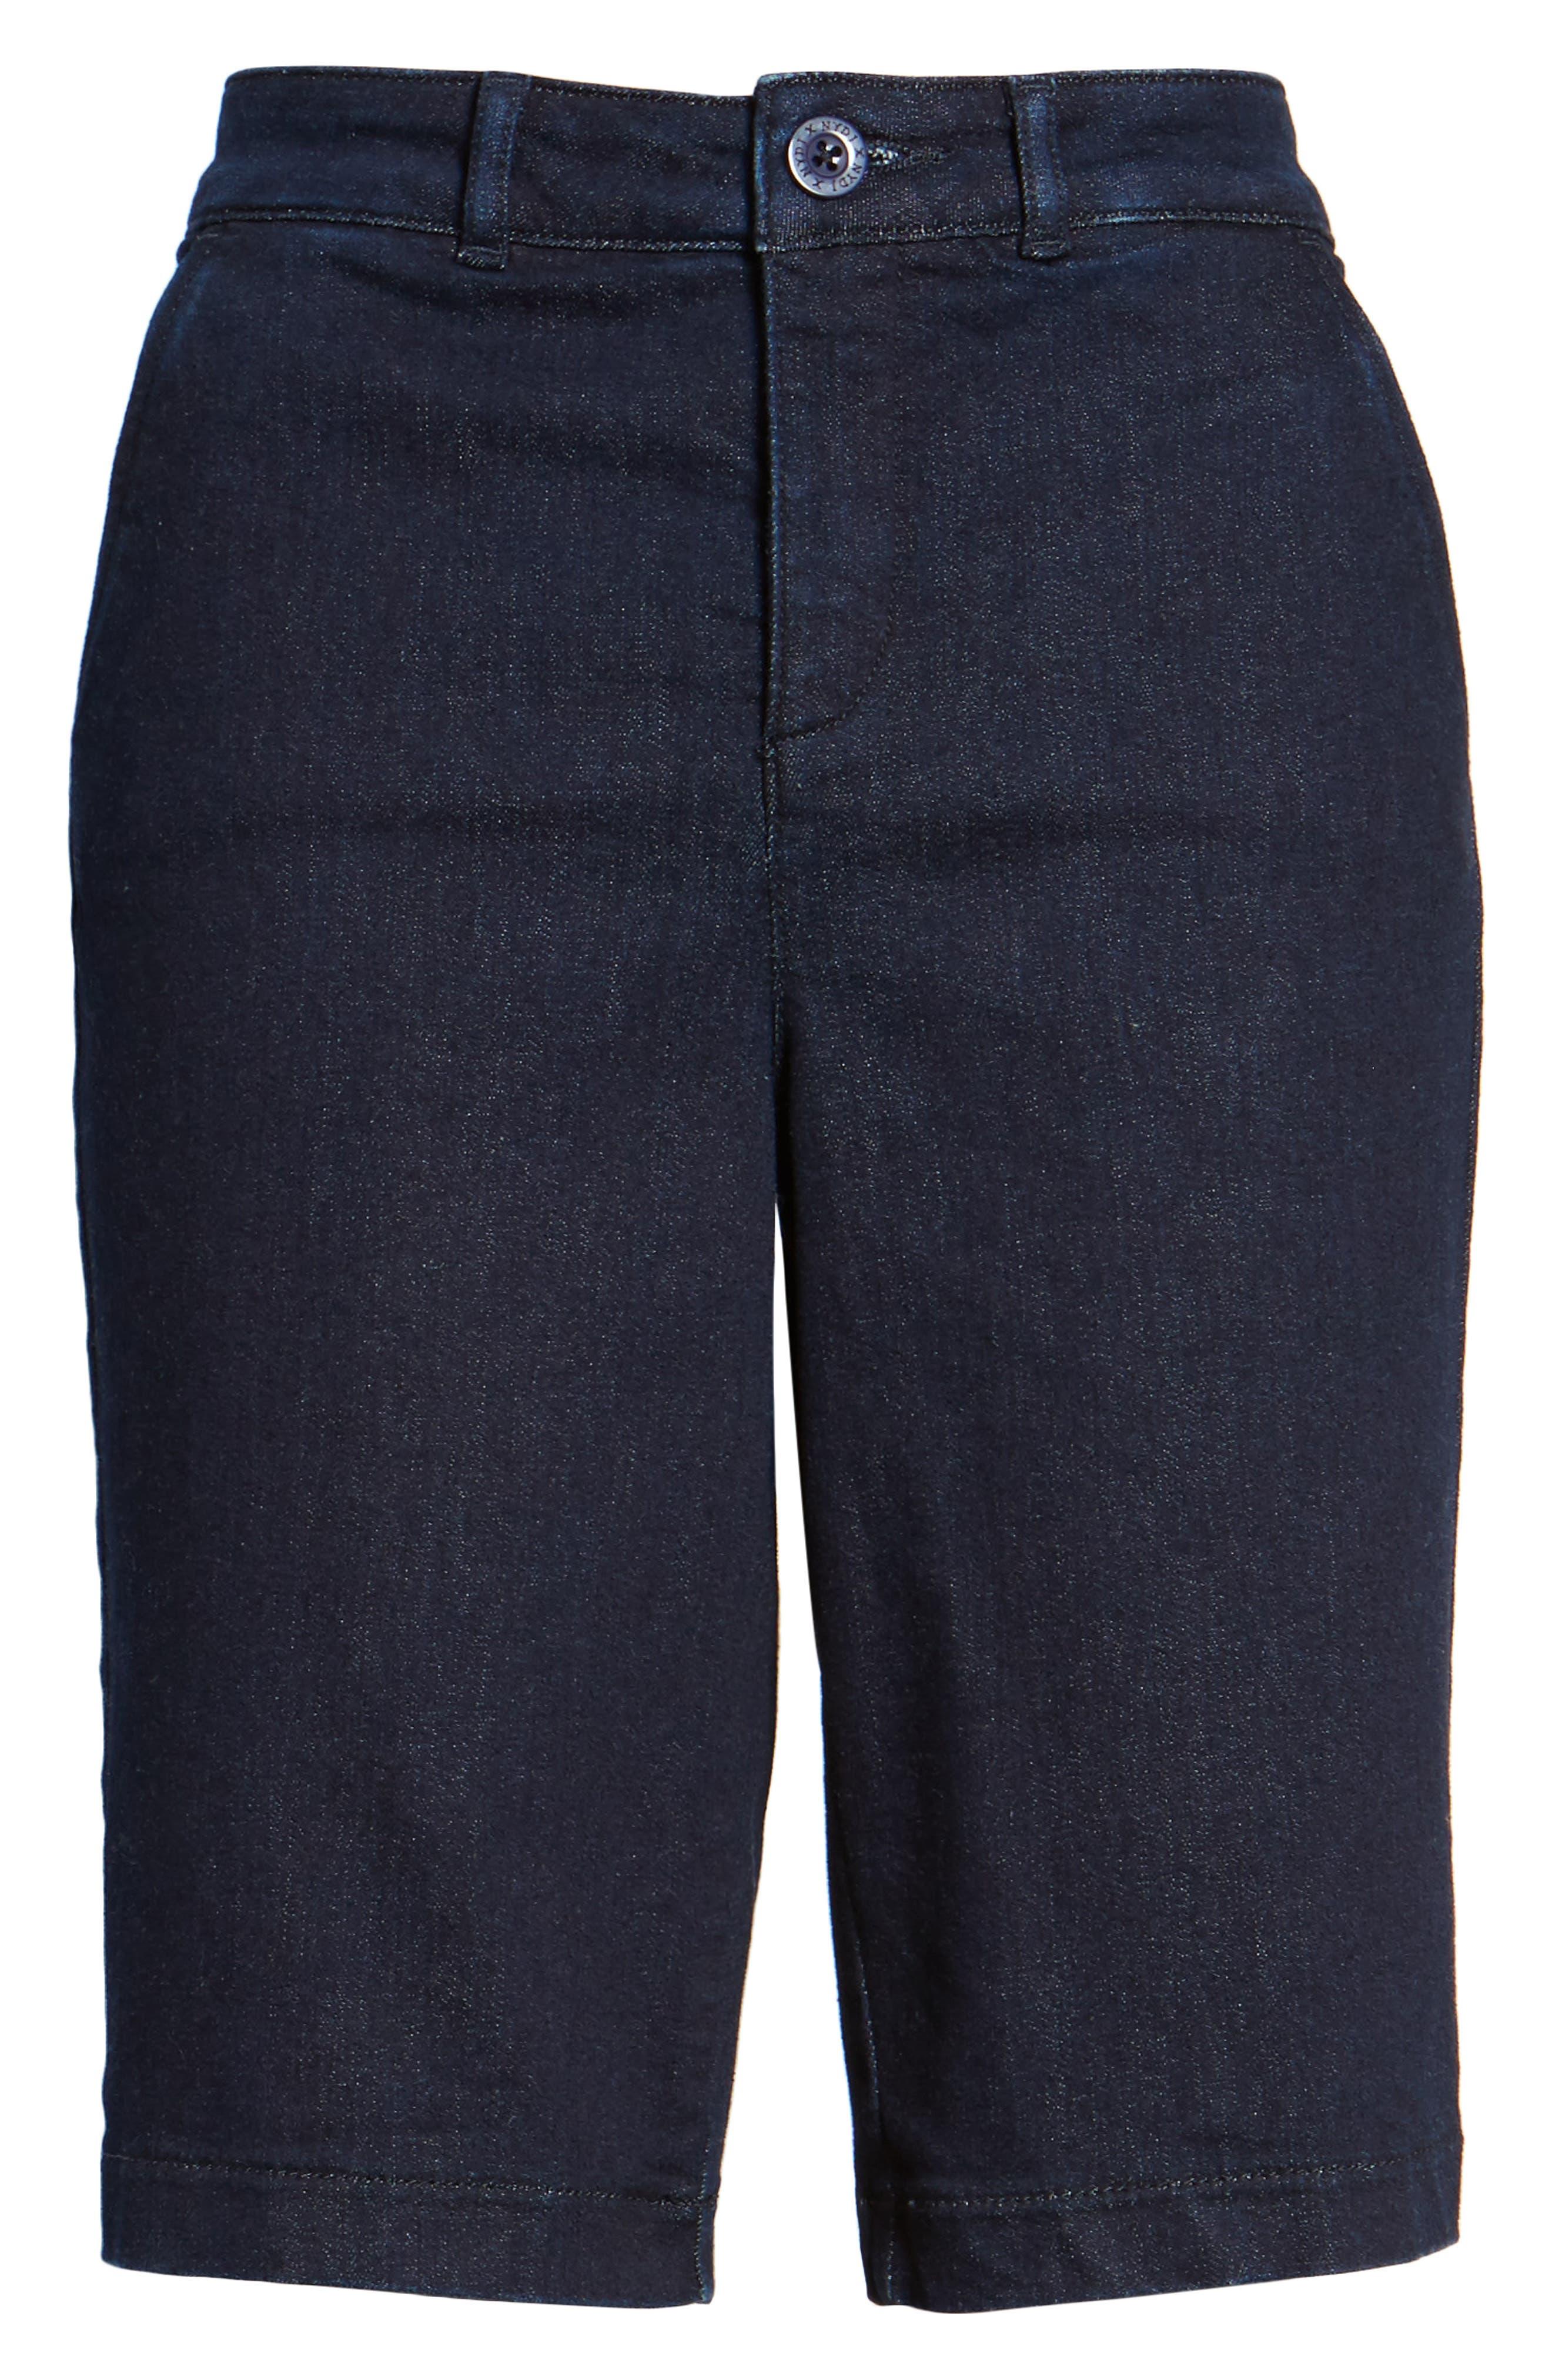 Marilyn Stretch Denim Bermuda Shorts,                             Alternate thumbnail 6, color,                             RINSE